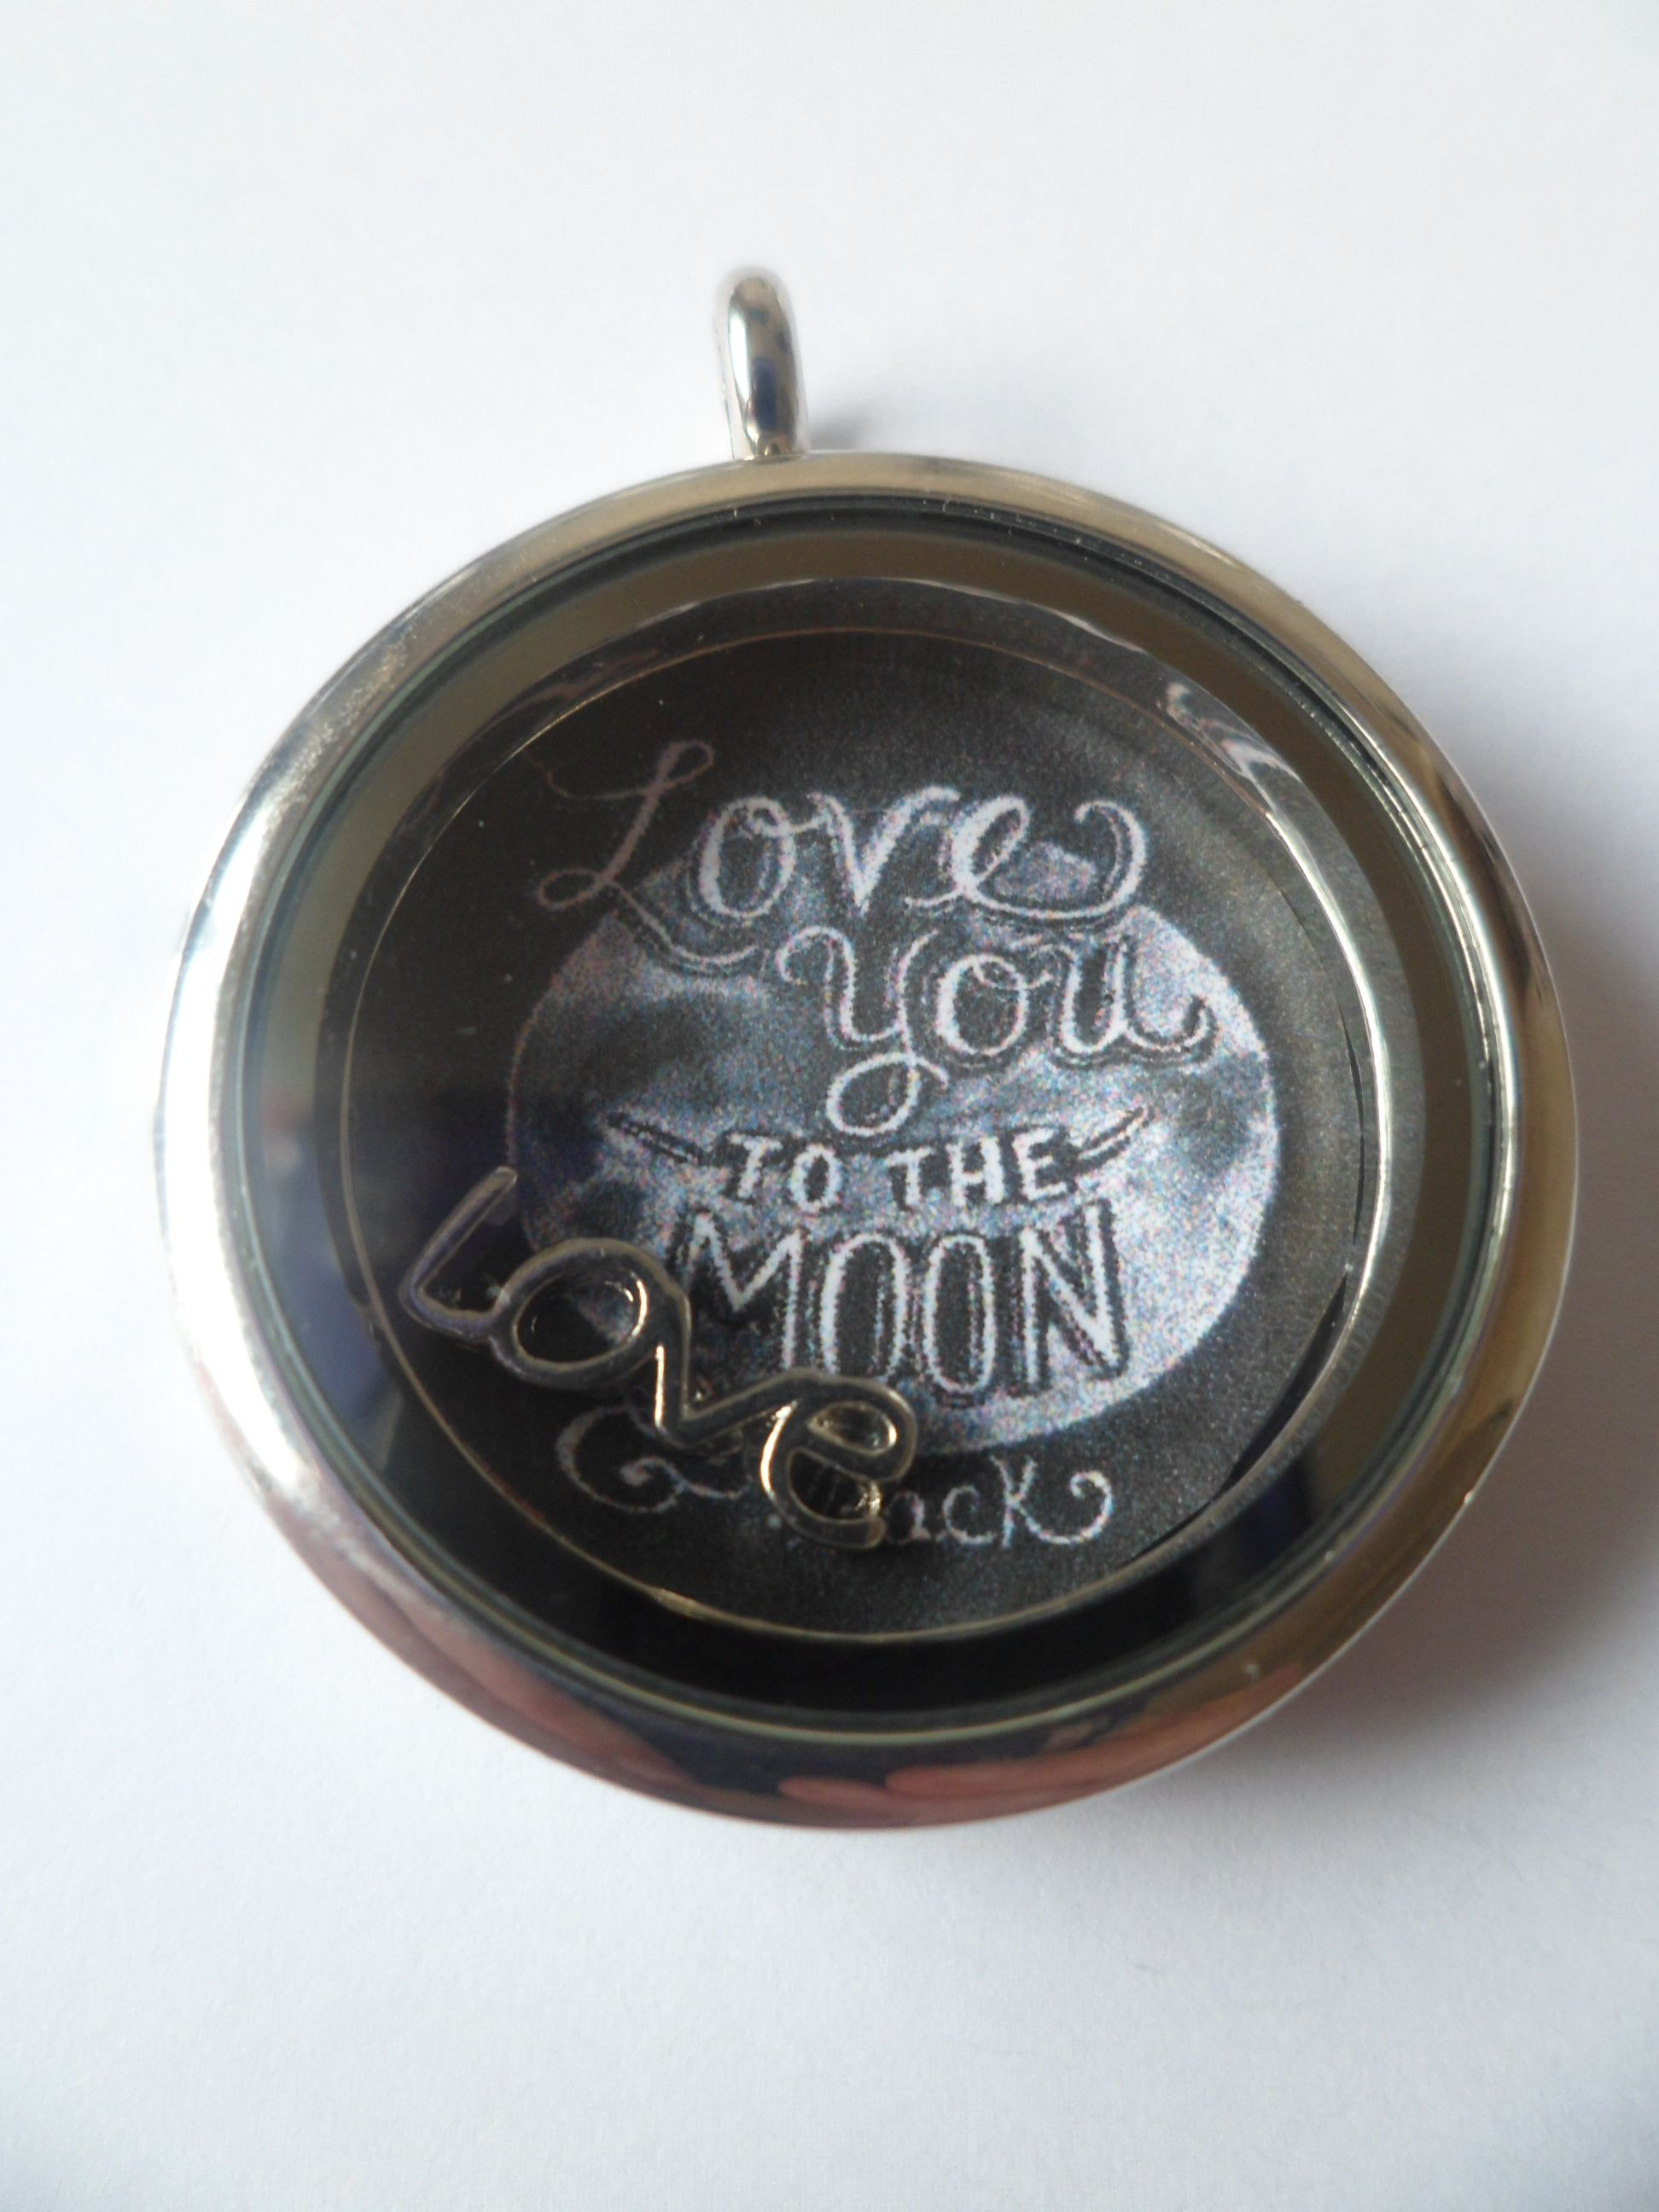 Love You To The Moon And Back Locket  #floatinglocket #LoveYouToTheMoonAndBack #Gift  www.facebook.com/locketsforyou123